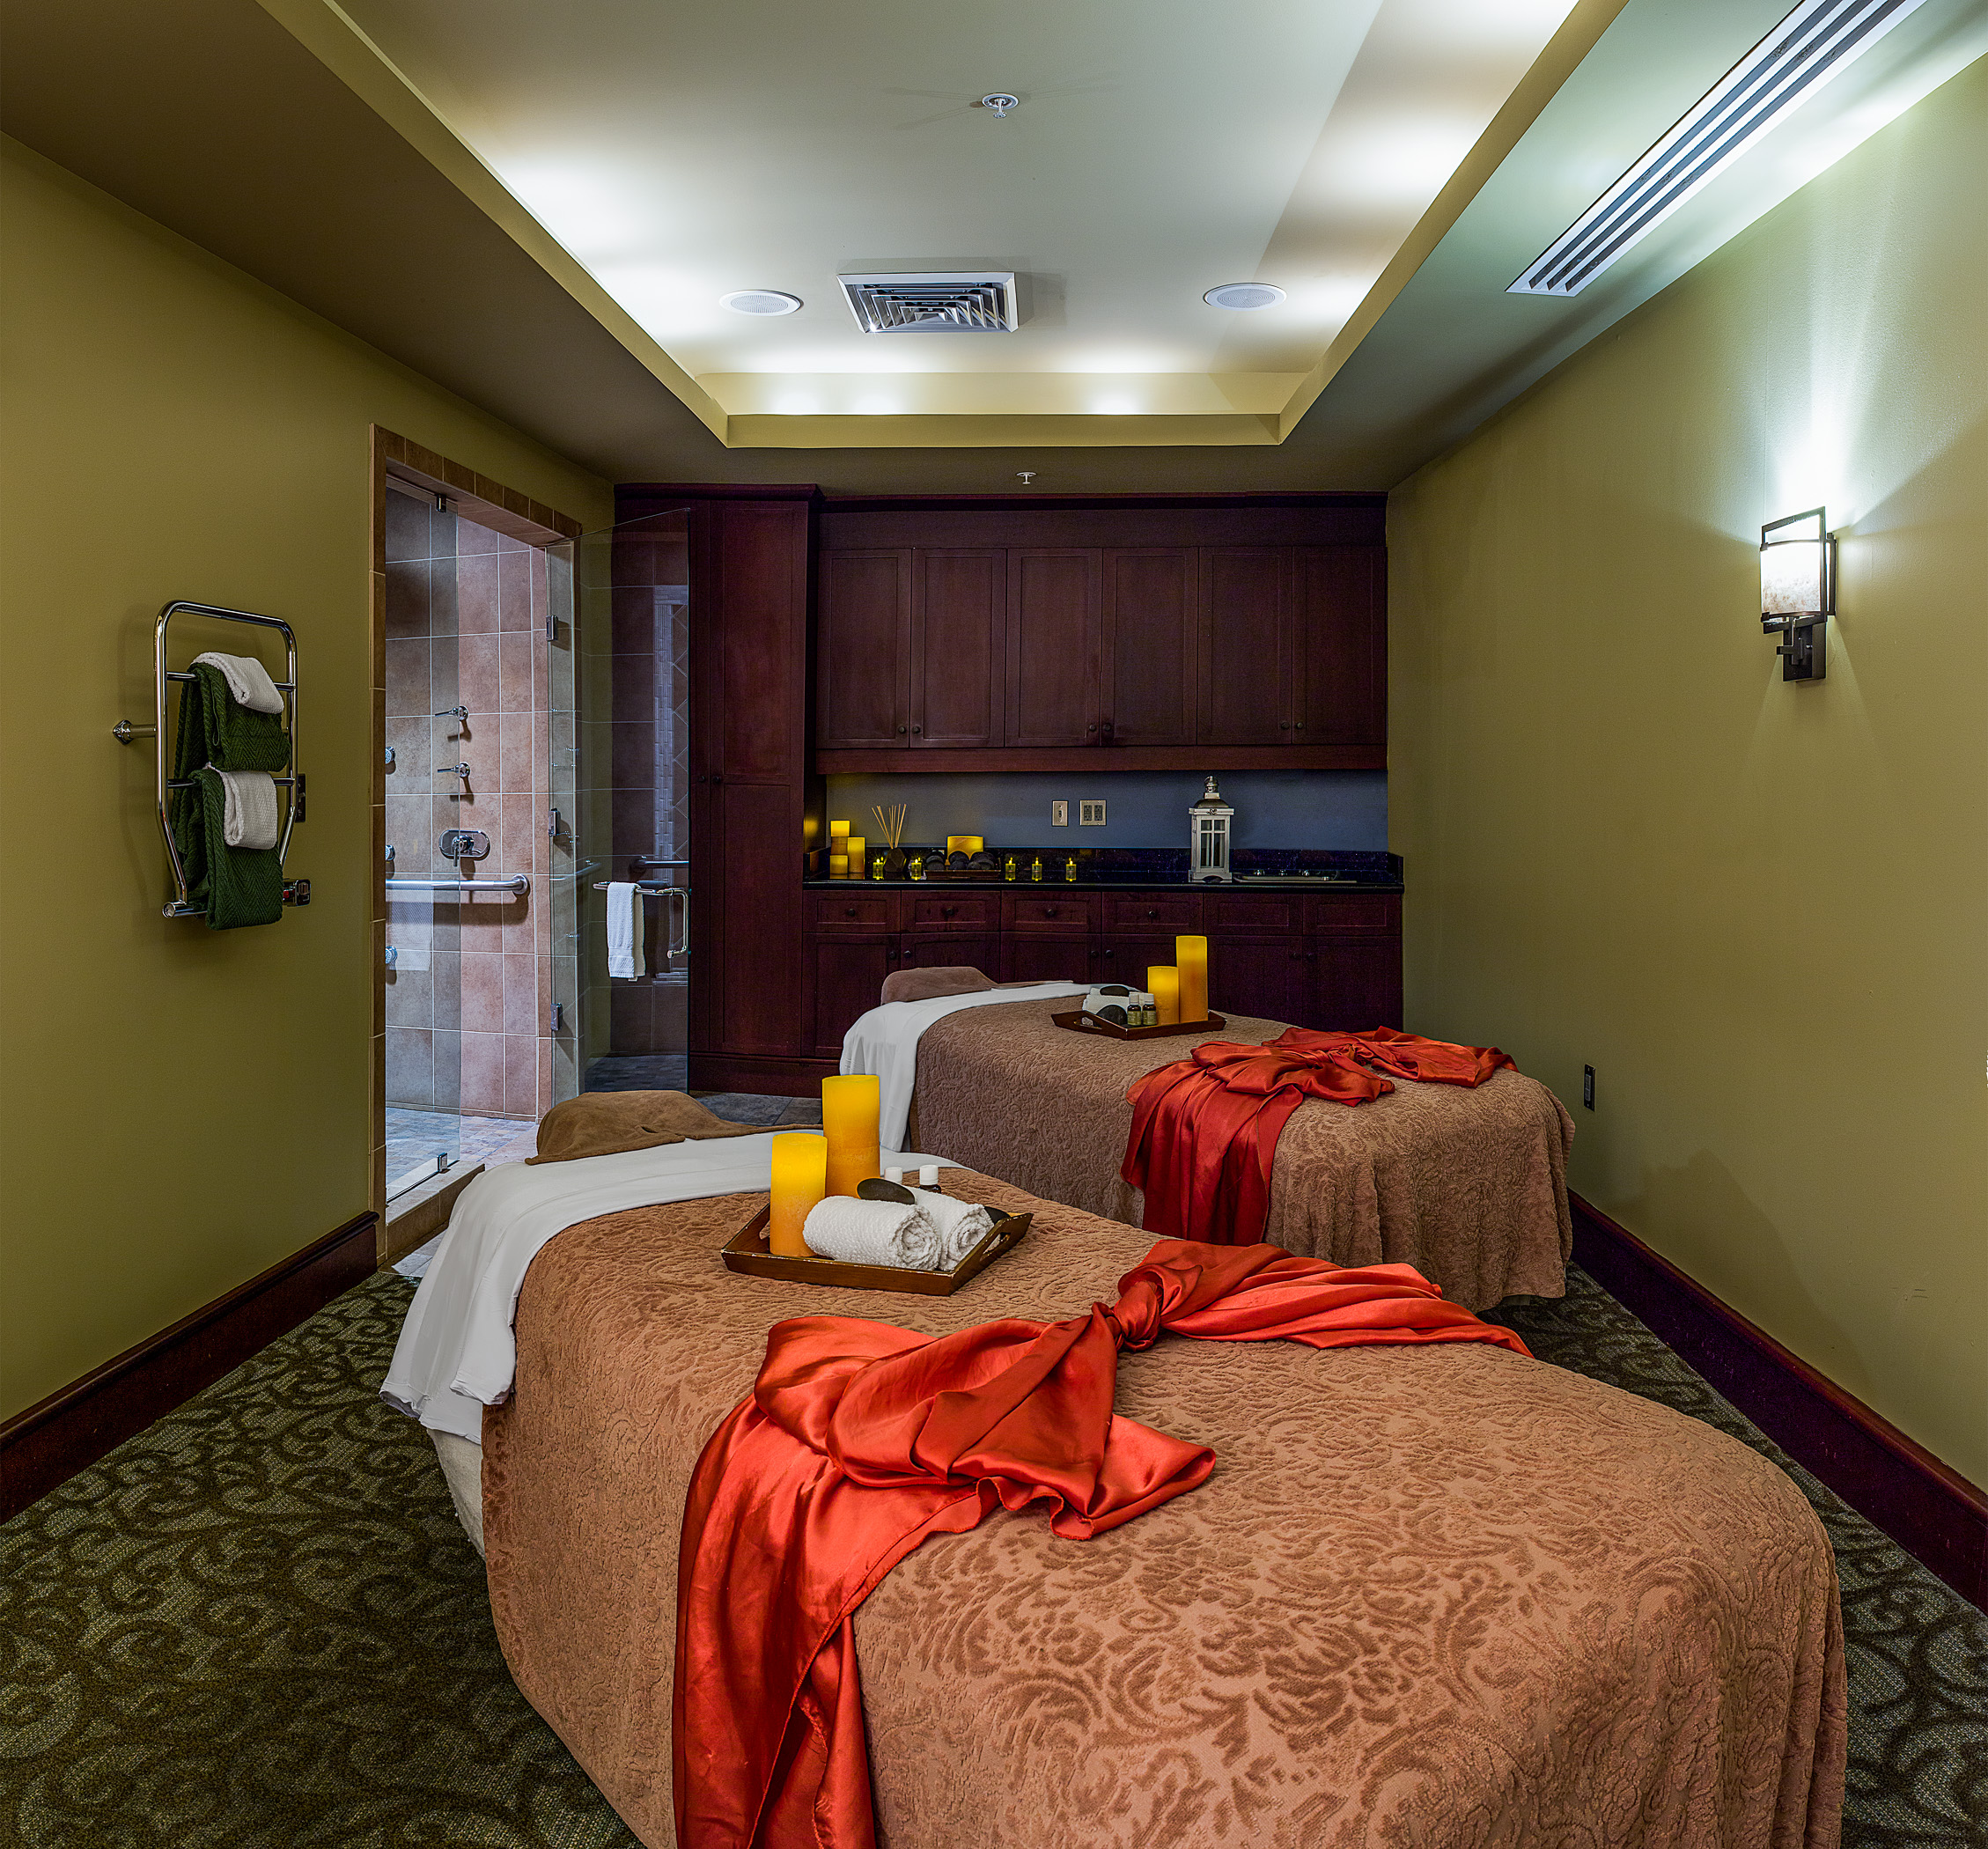 https://alabama-travel.s3.amazonaws.com/partners-uploads/photo/image/5a98200cce7d766e07000025/spa_02_massage_room.jpg